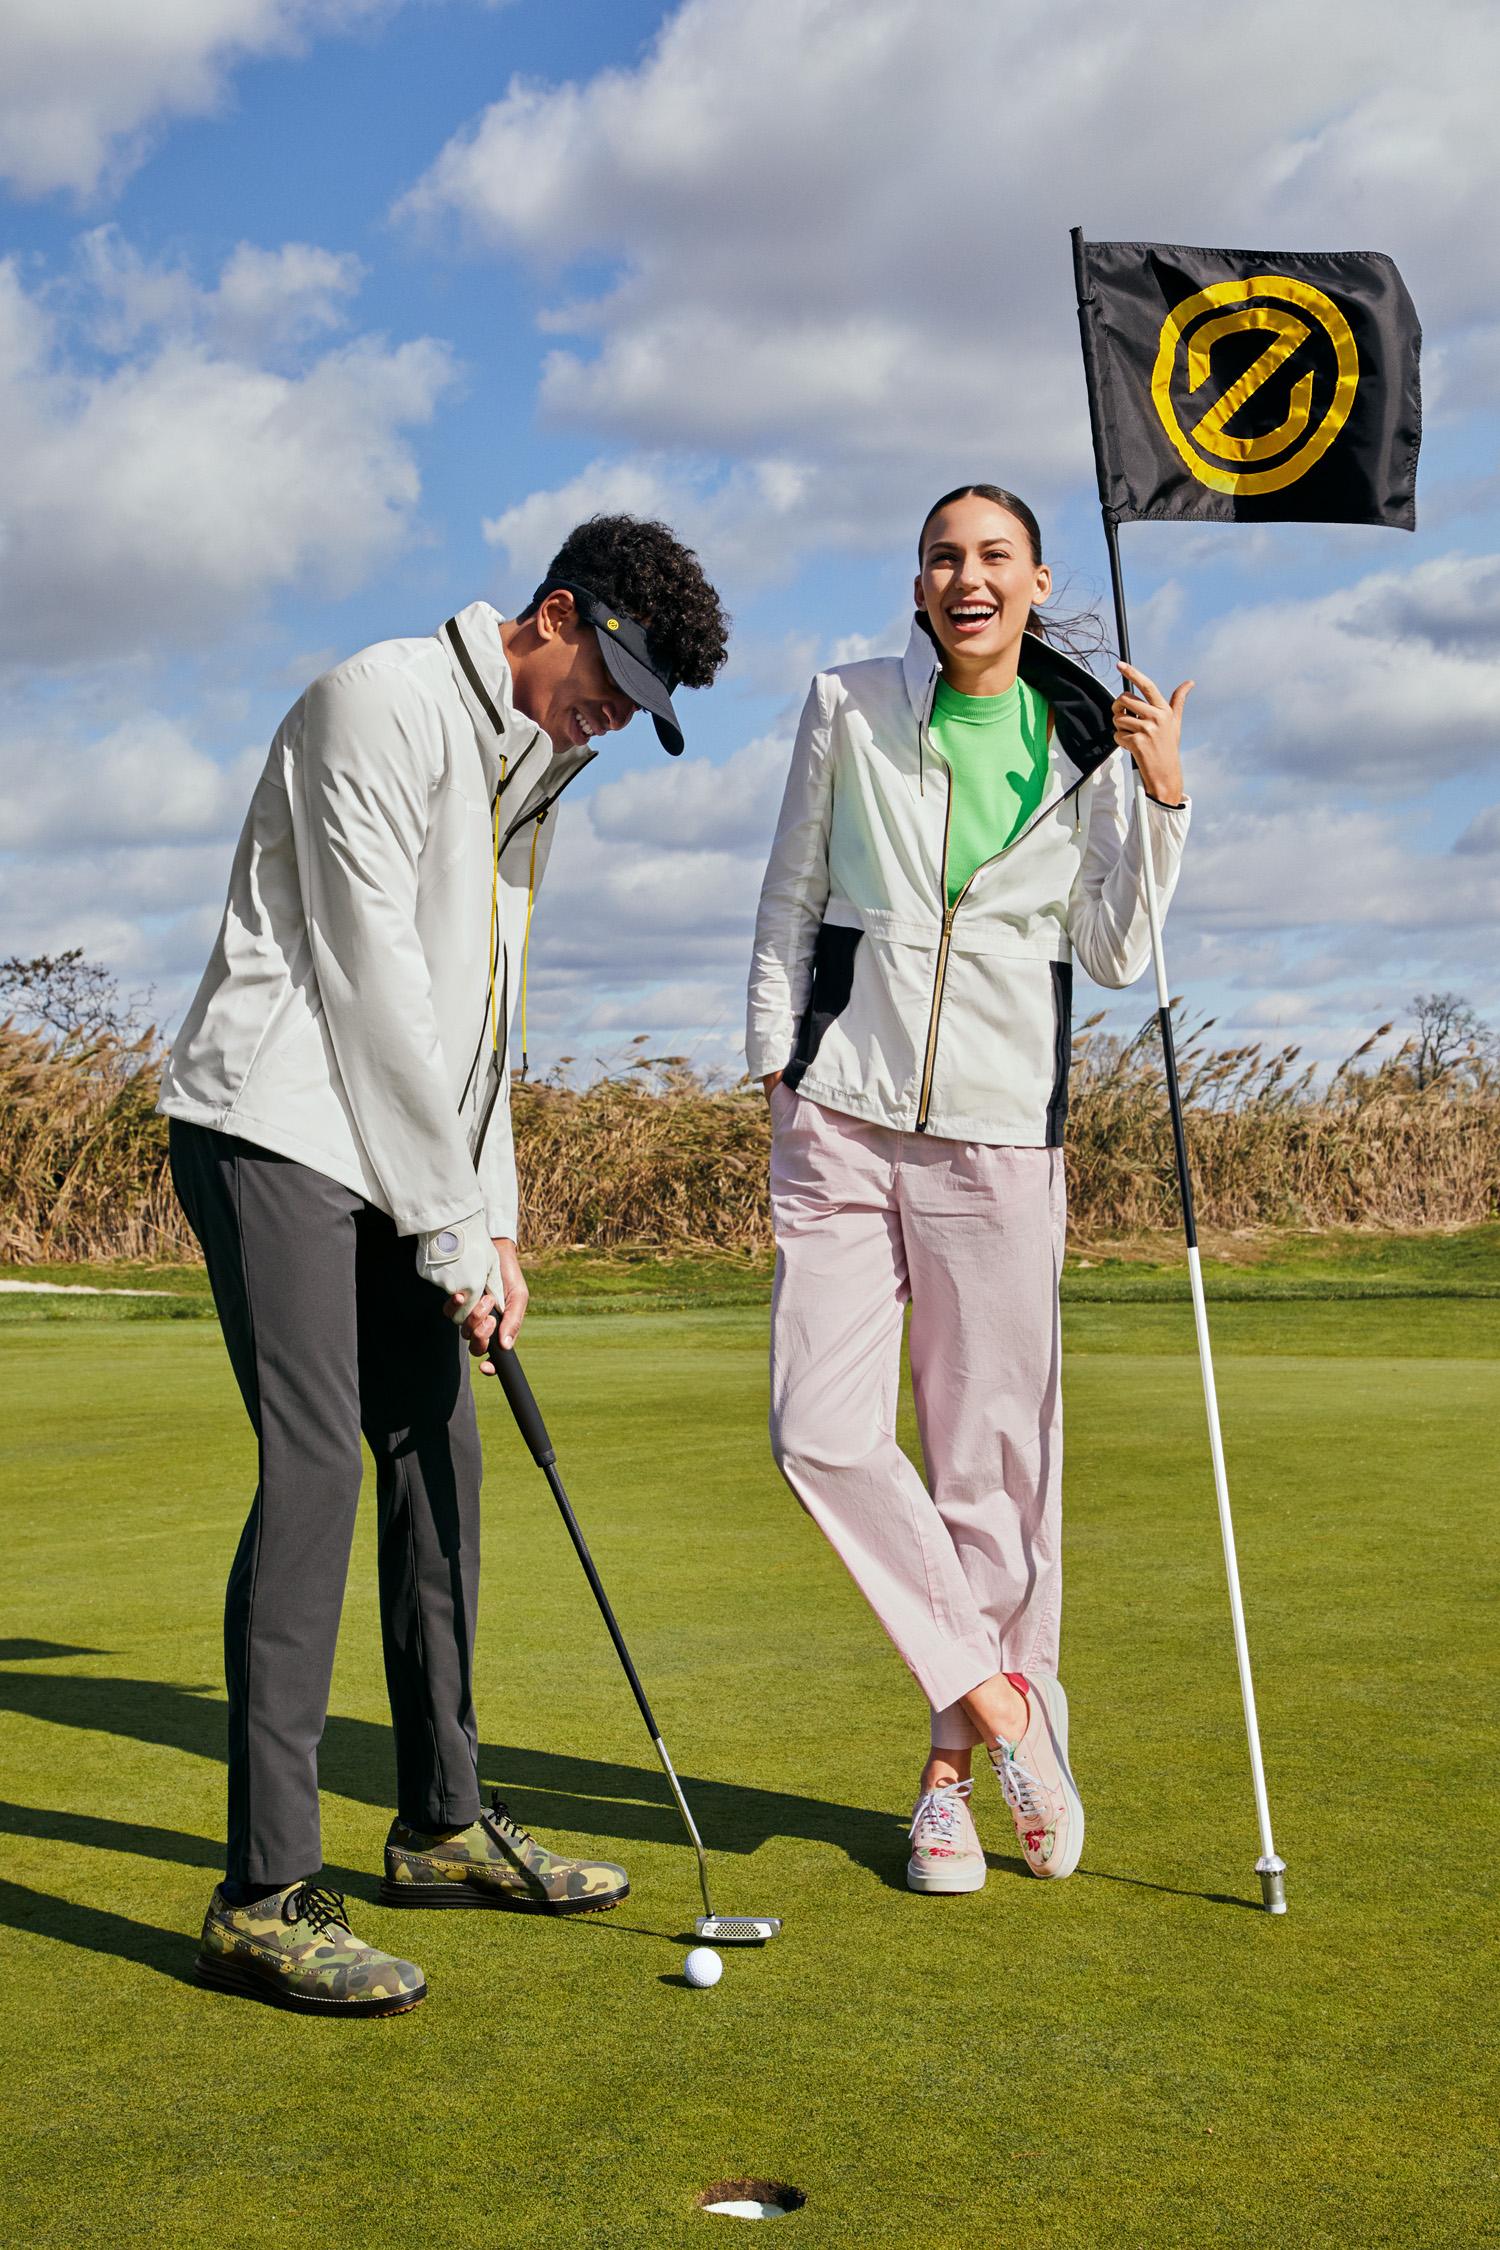 Cole Haan Men's ØriginalGrand Golf Shoe and Women's GrandPrø AM Golf Sneaker